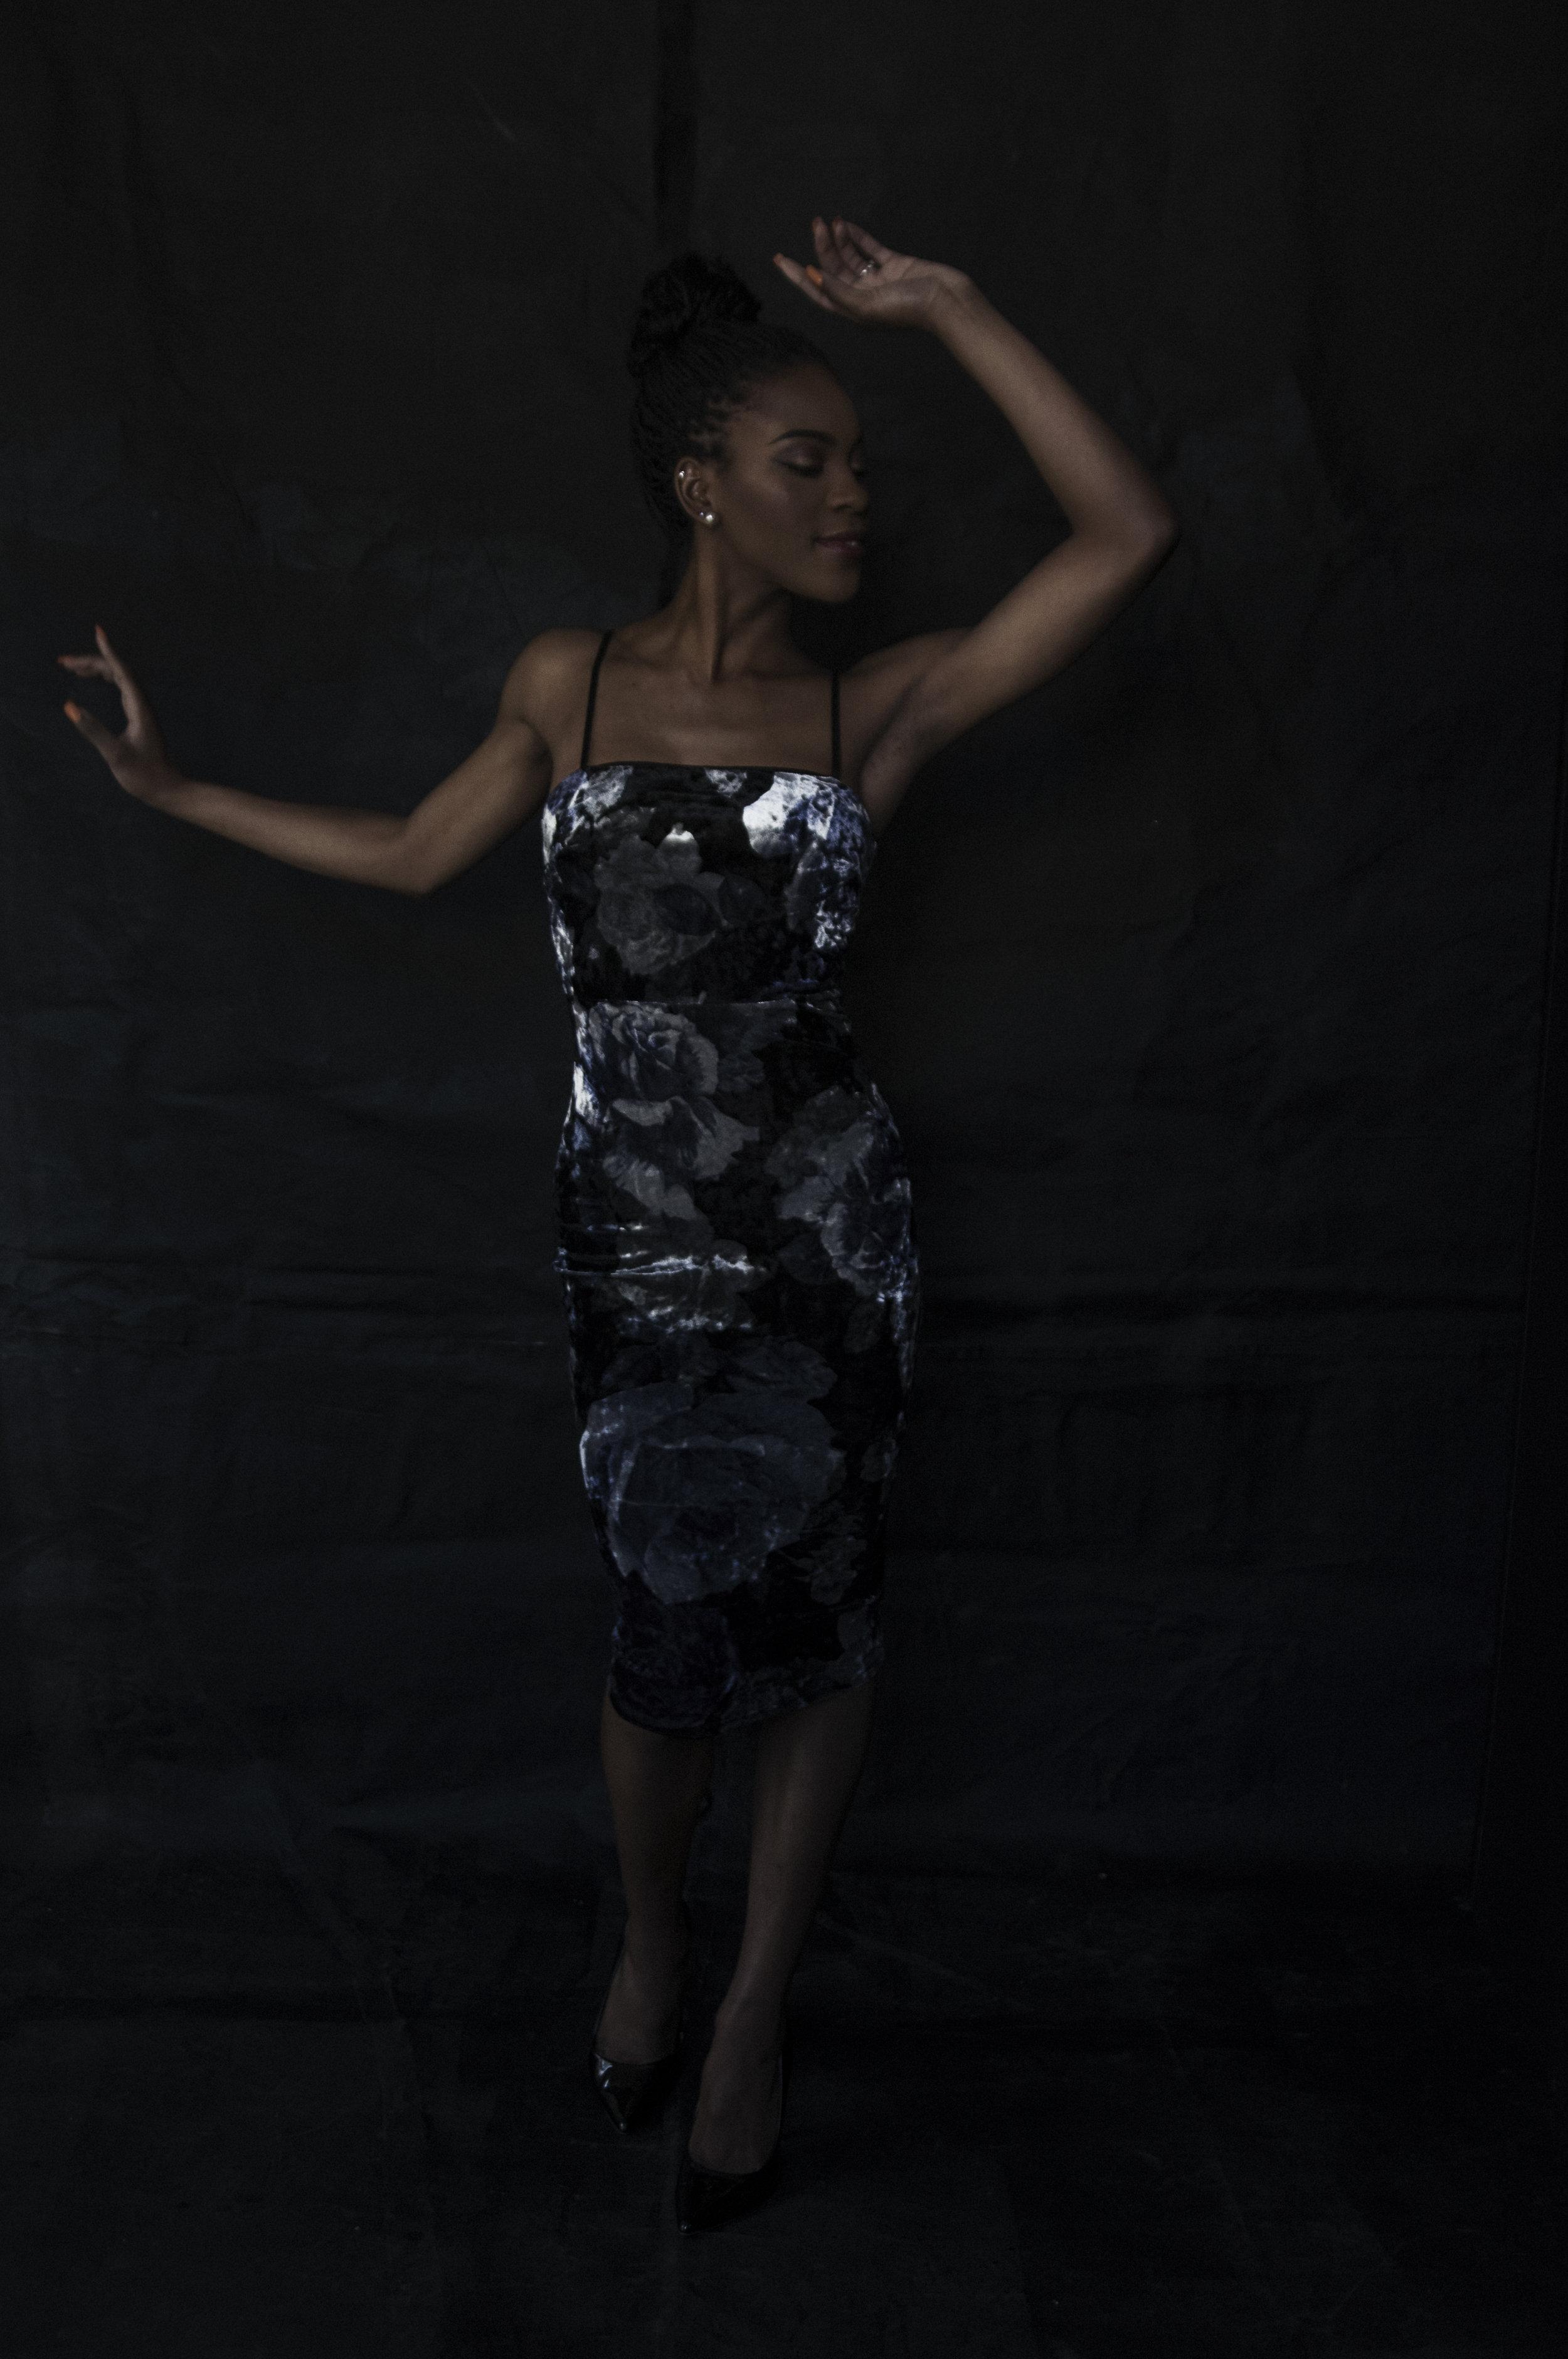 Dark portrait of a woman dancing